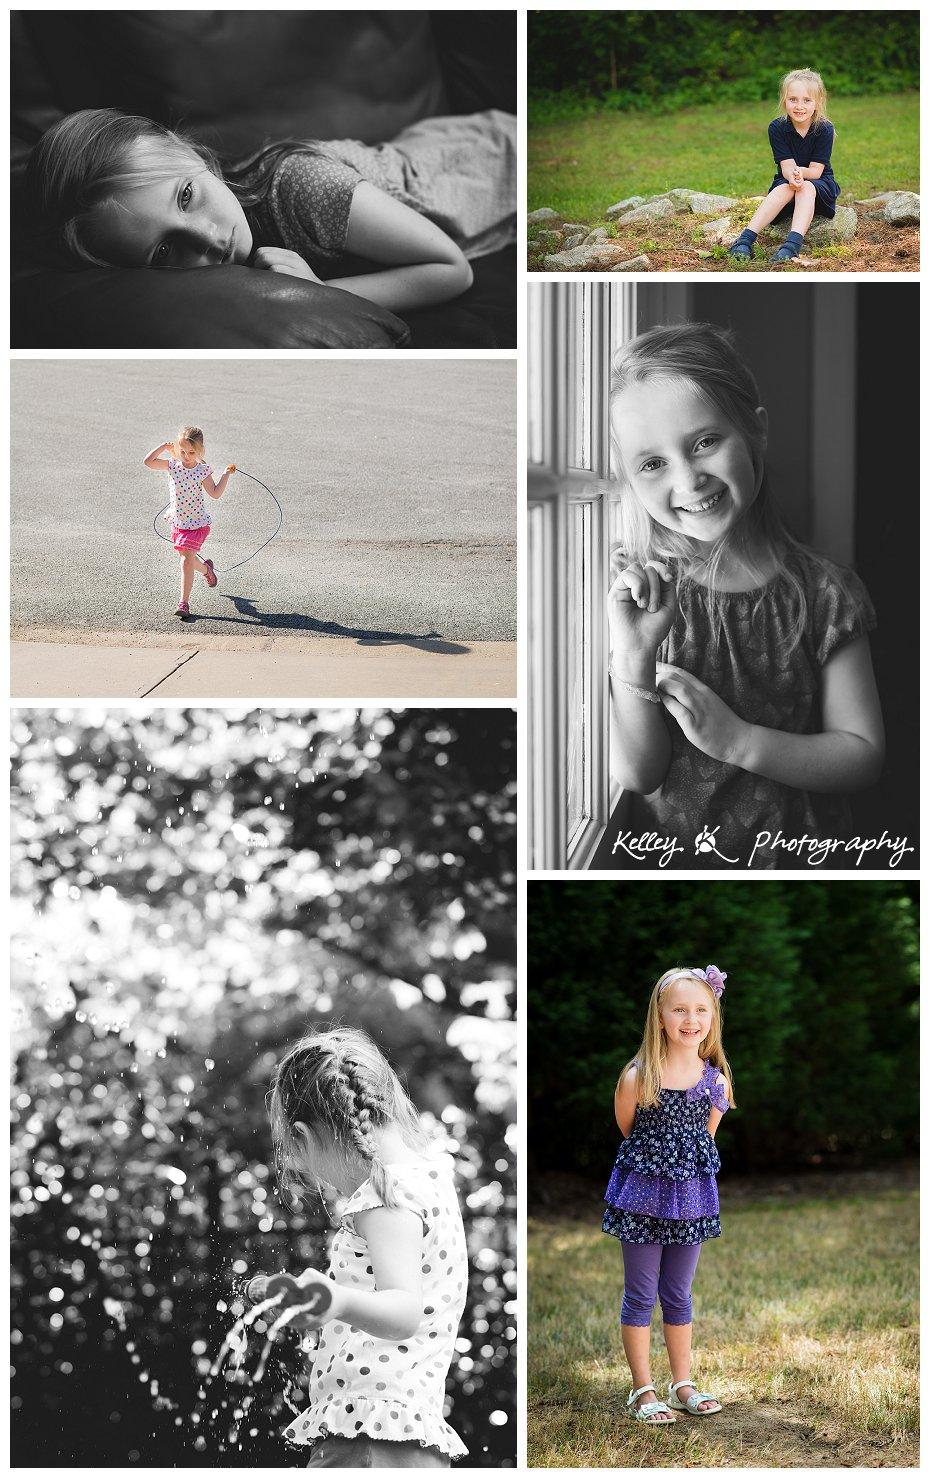 KelleyKPhotography_0051.jpg